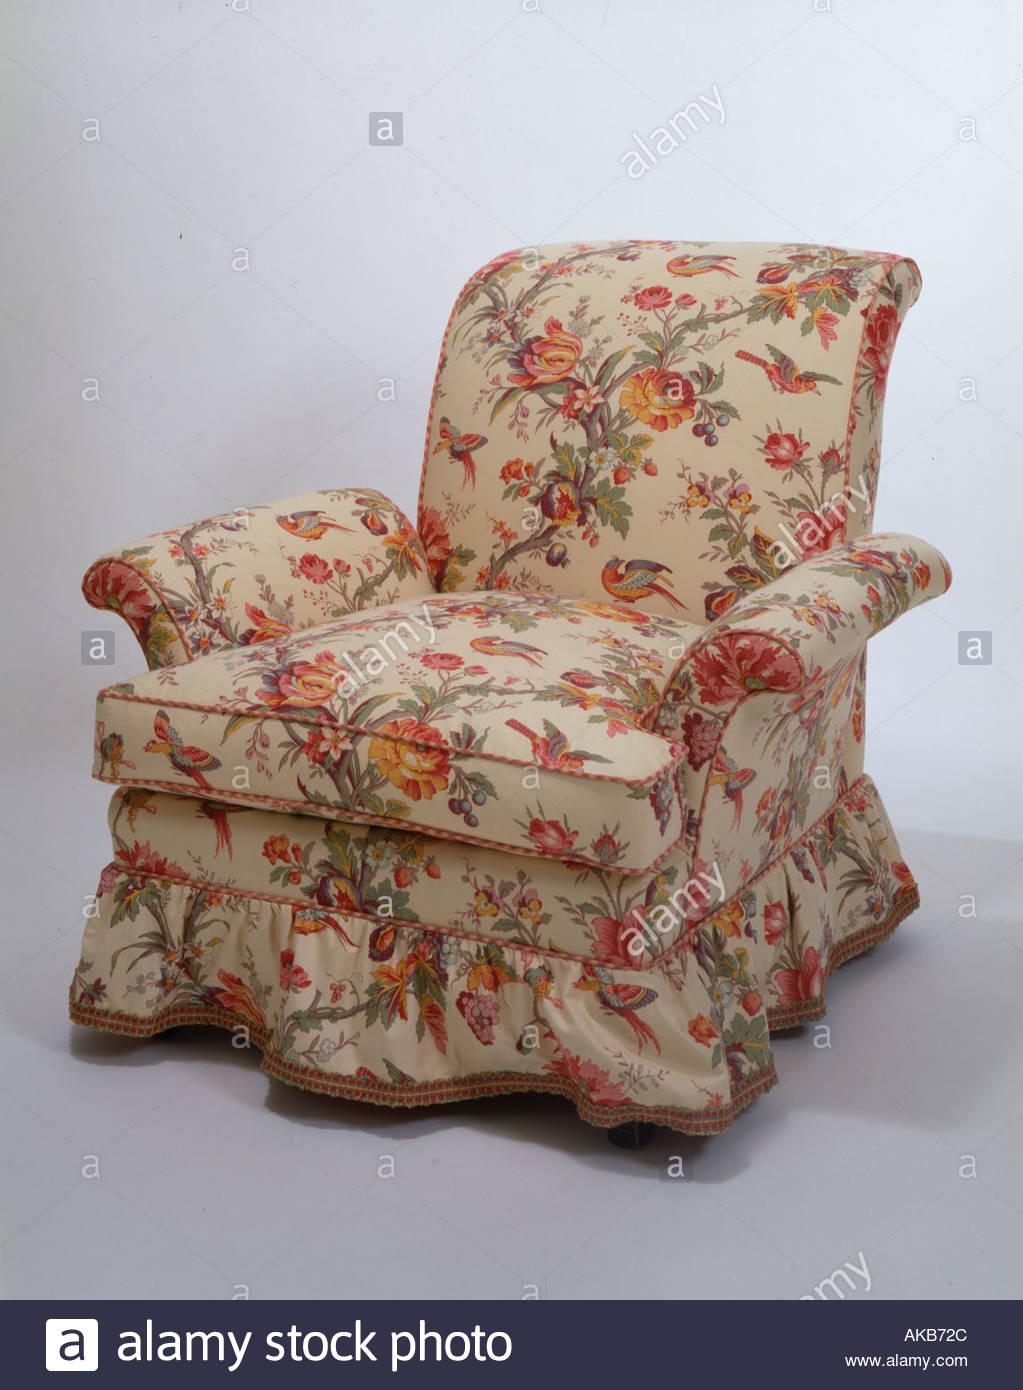 a comfortable armchair - Stock Image